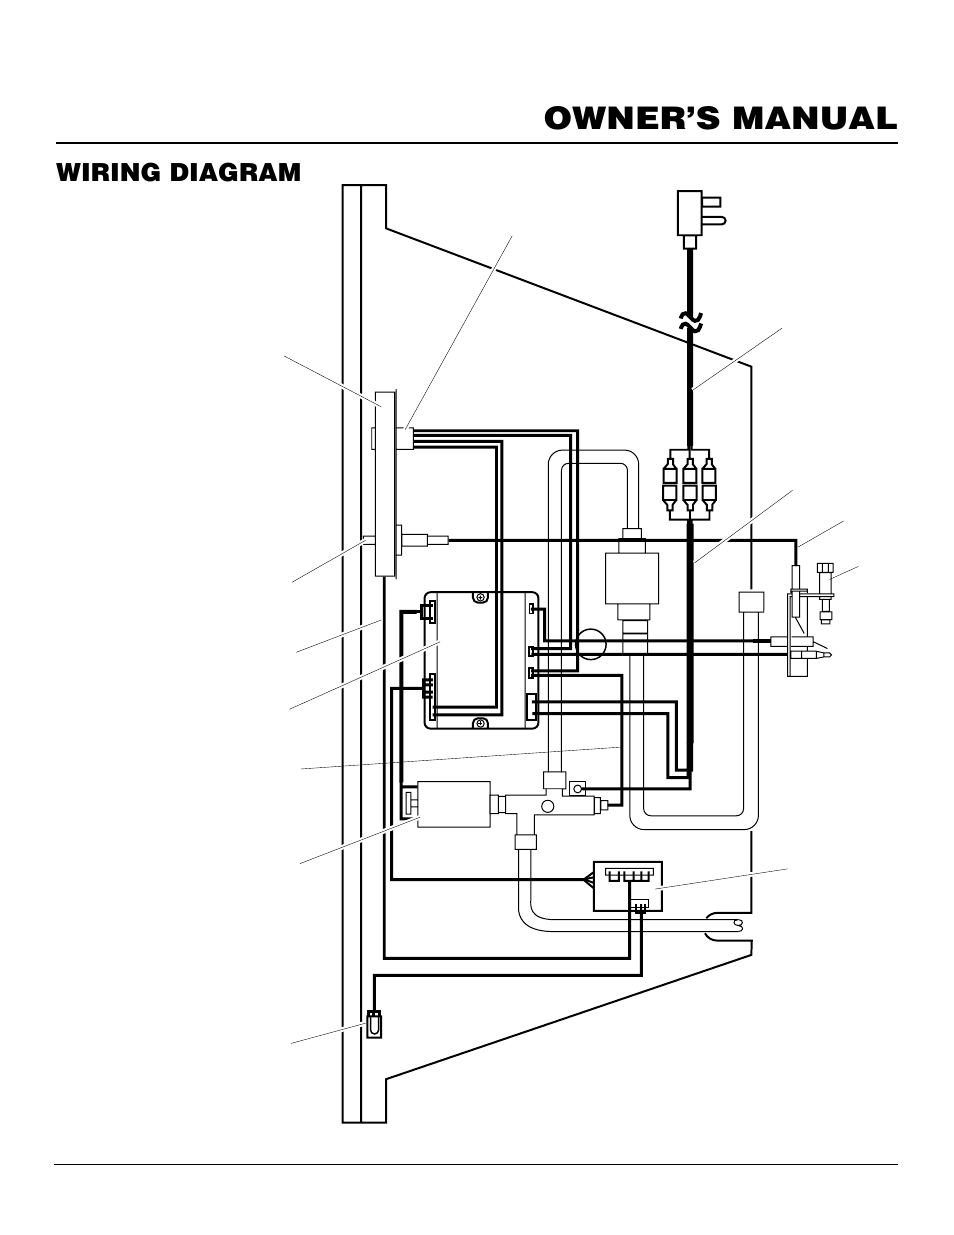 Owner U2019s Manual  Wiring Diagram